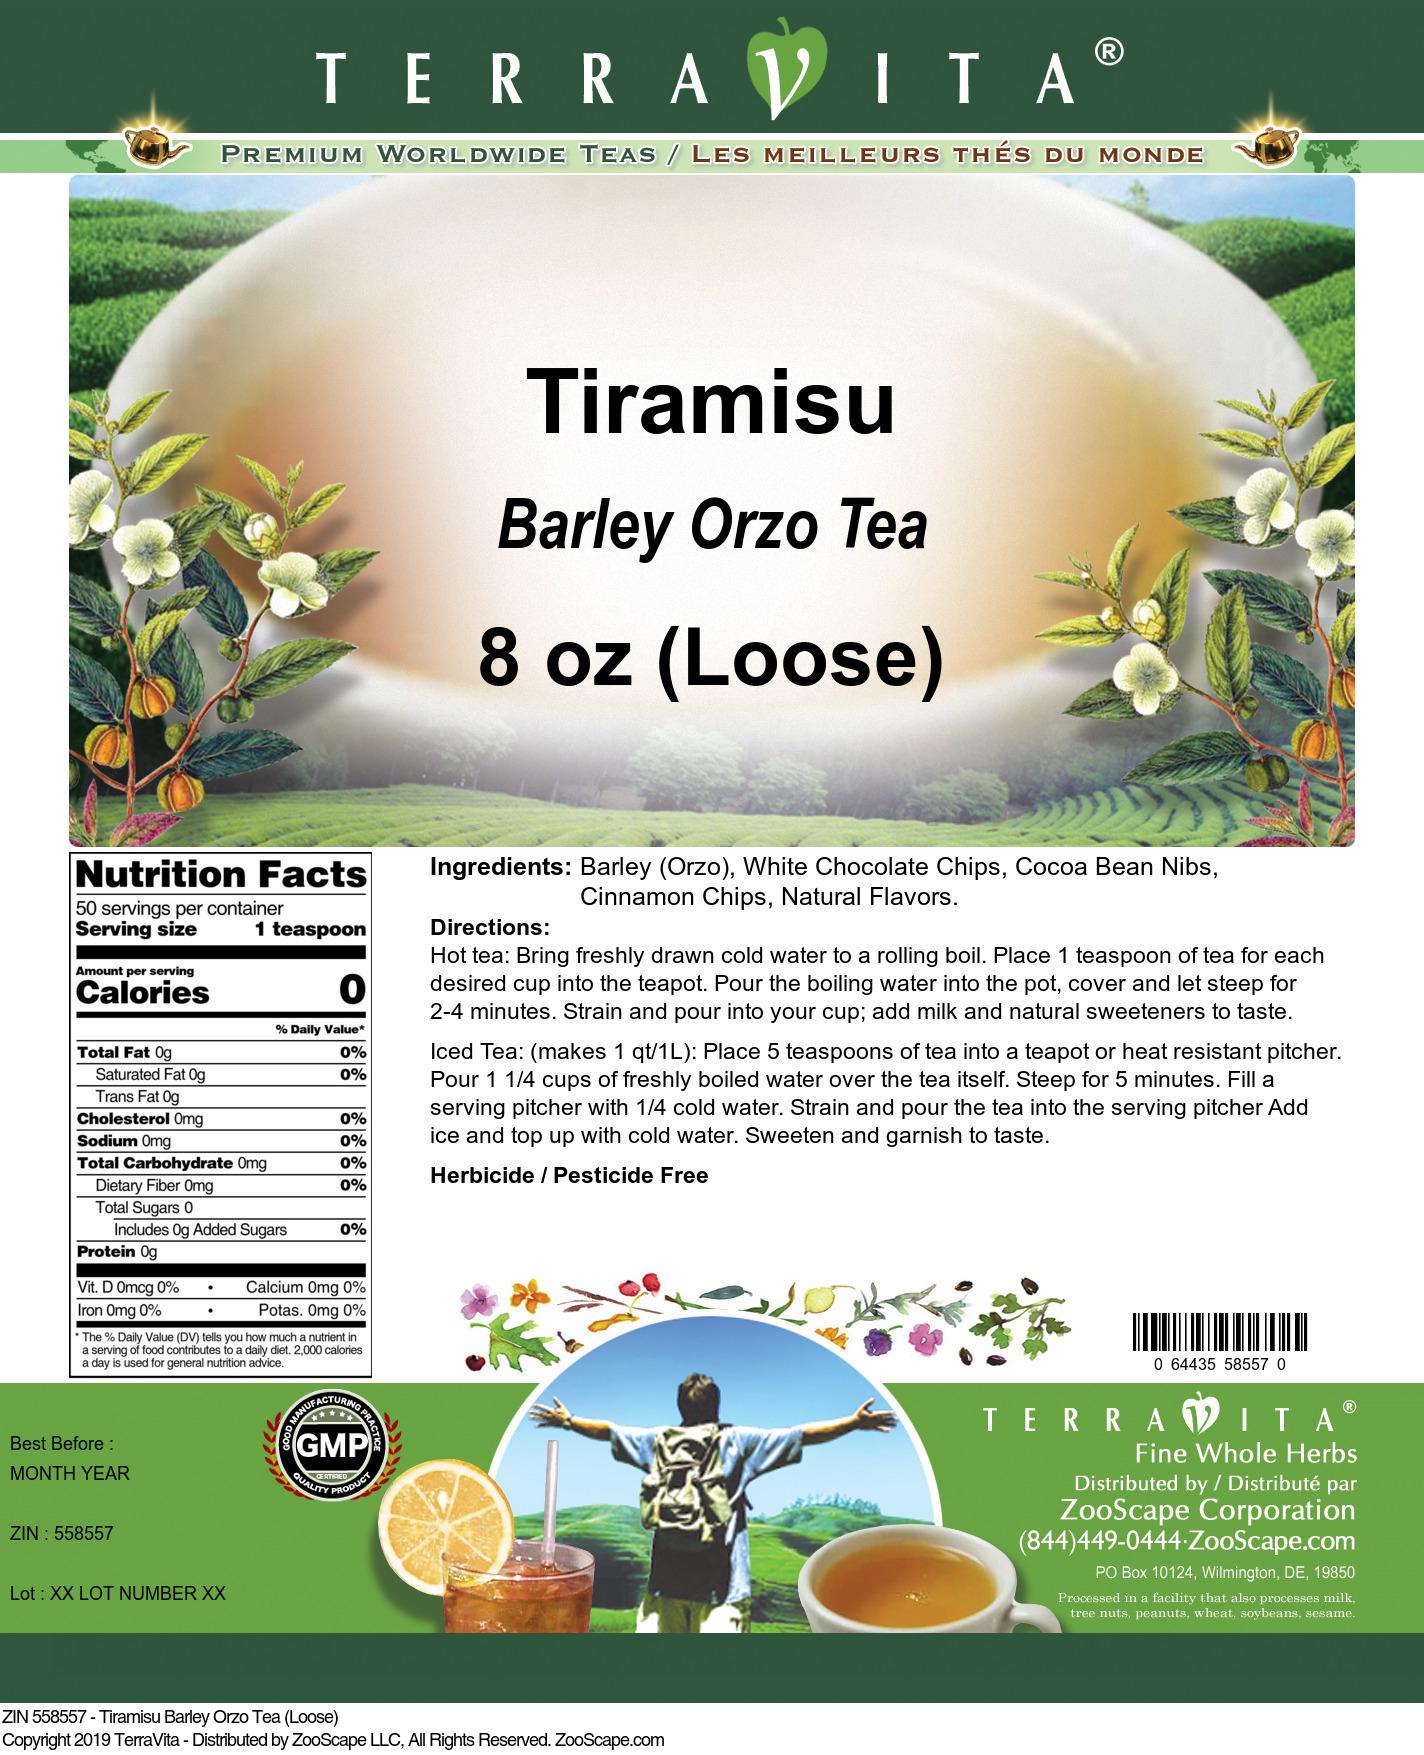 Tiramisu Barley Orzo